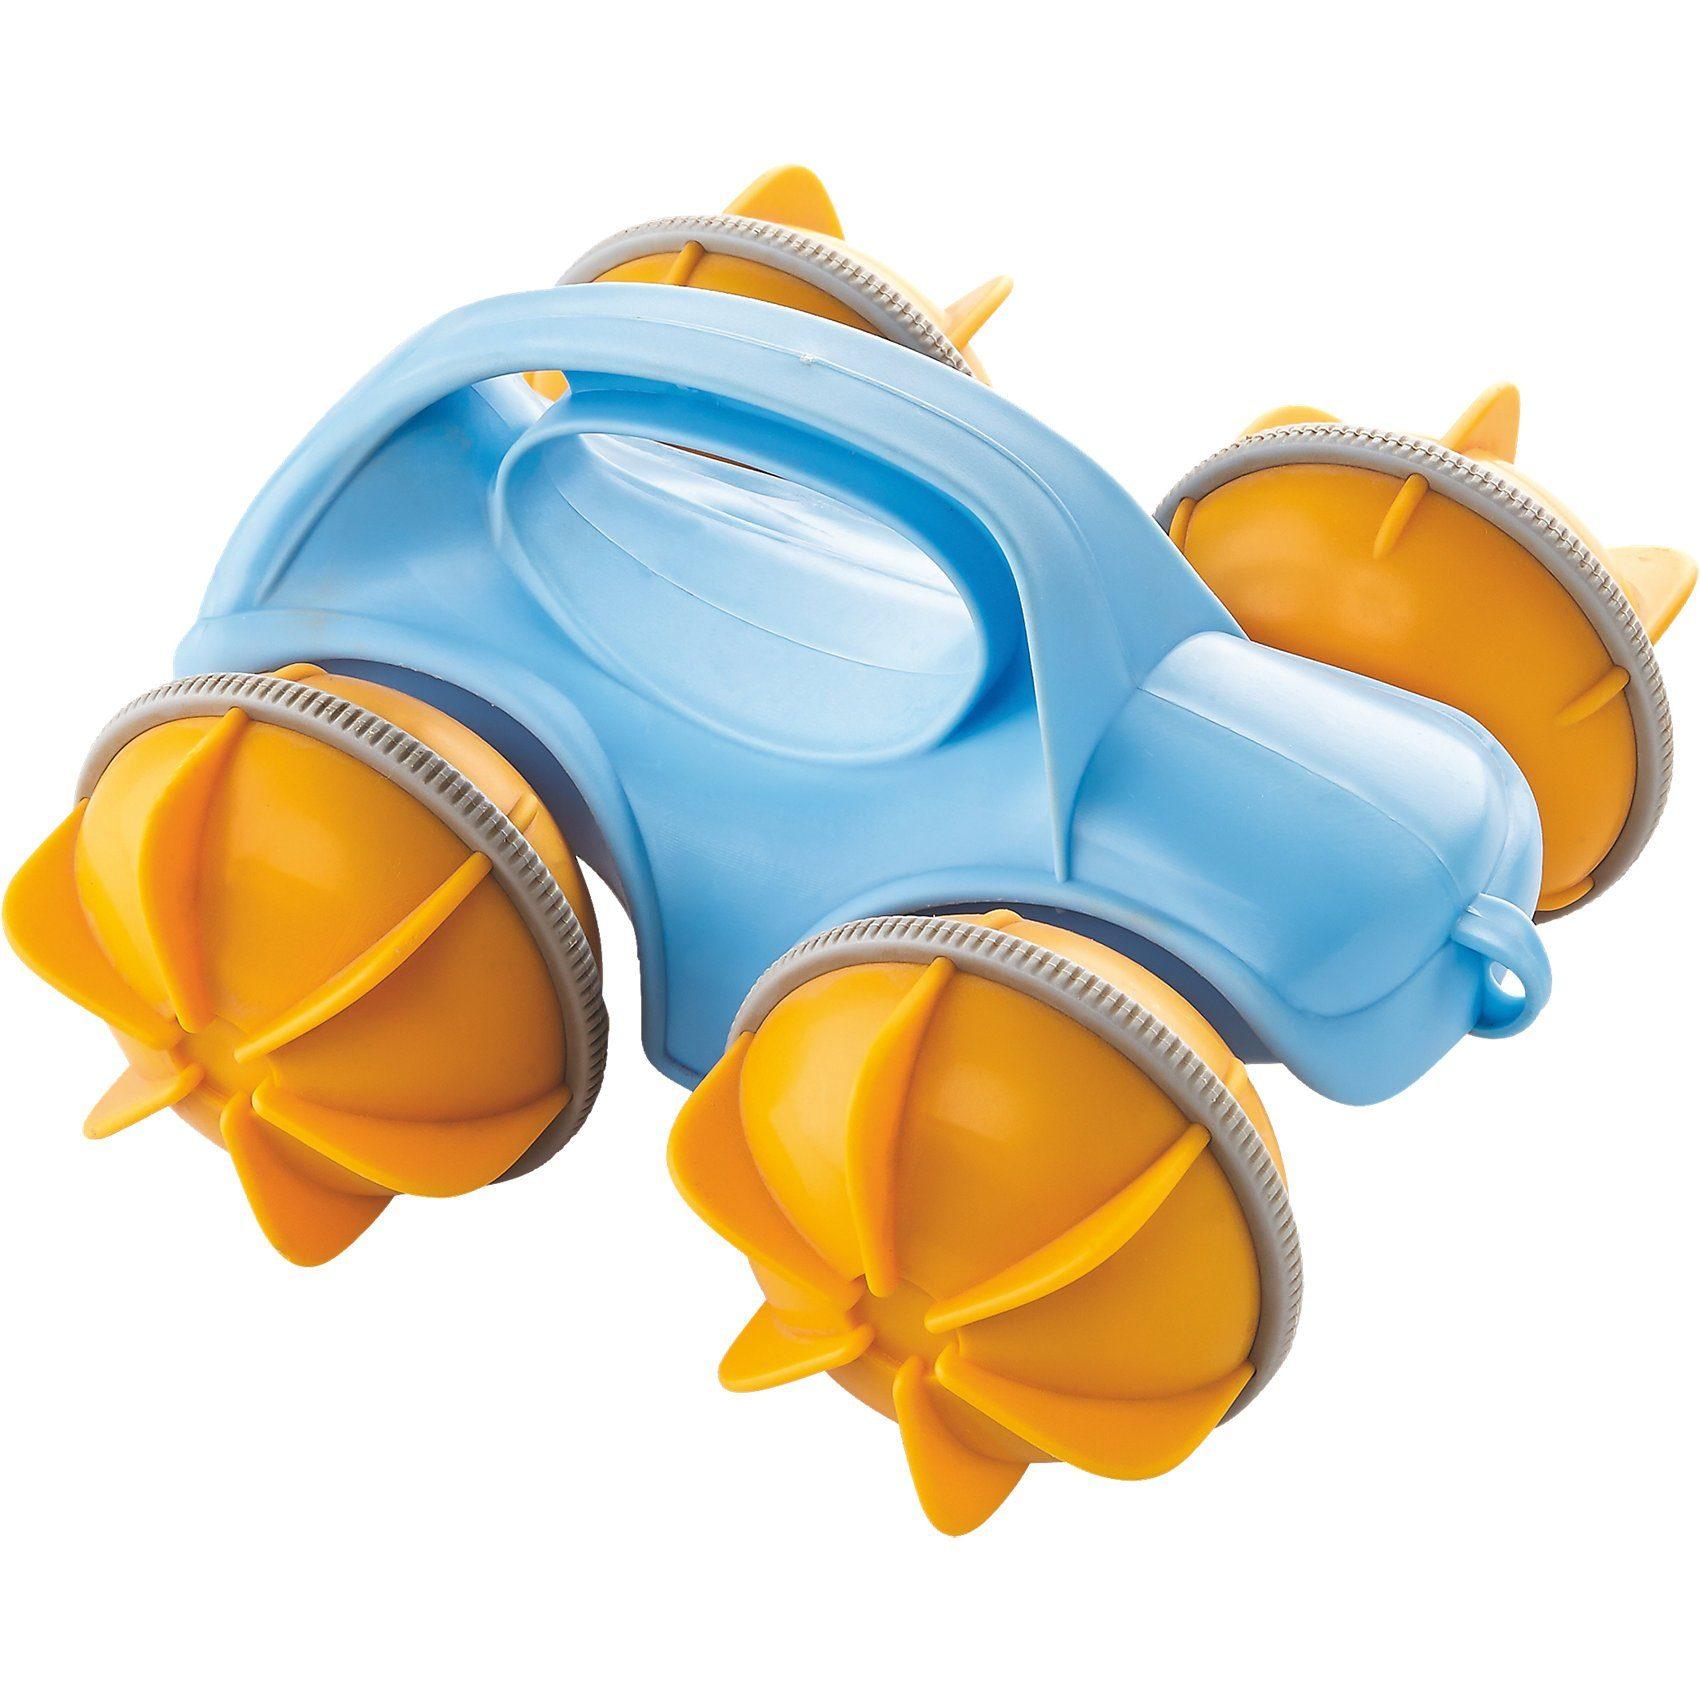 Haba Badespielzeug Amphibienfahrzeug